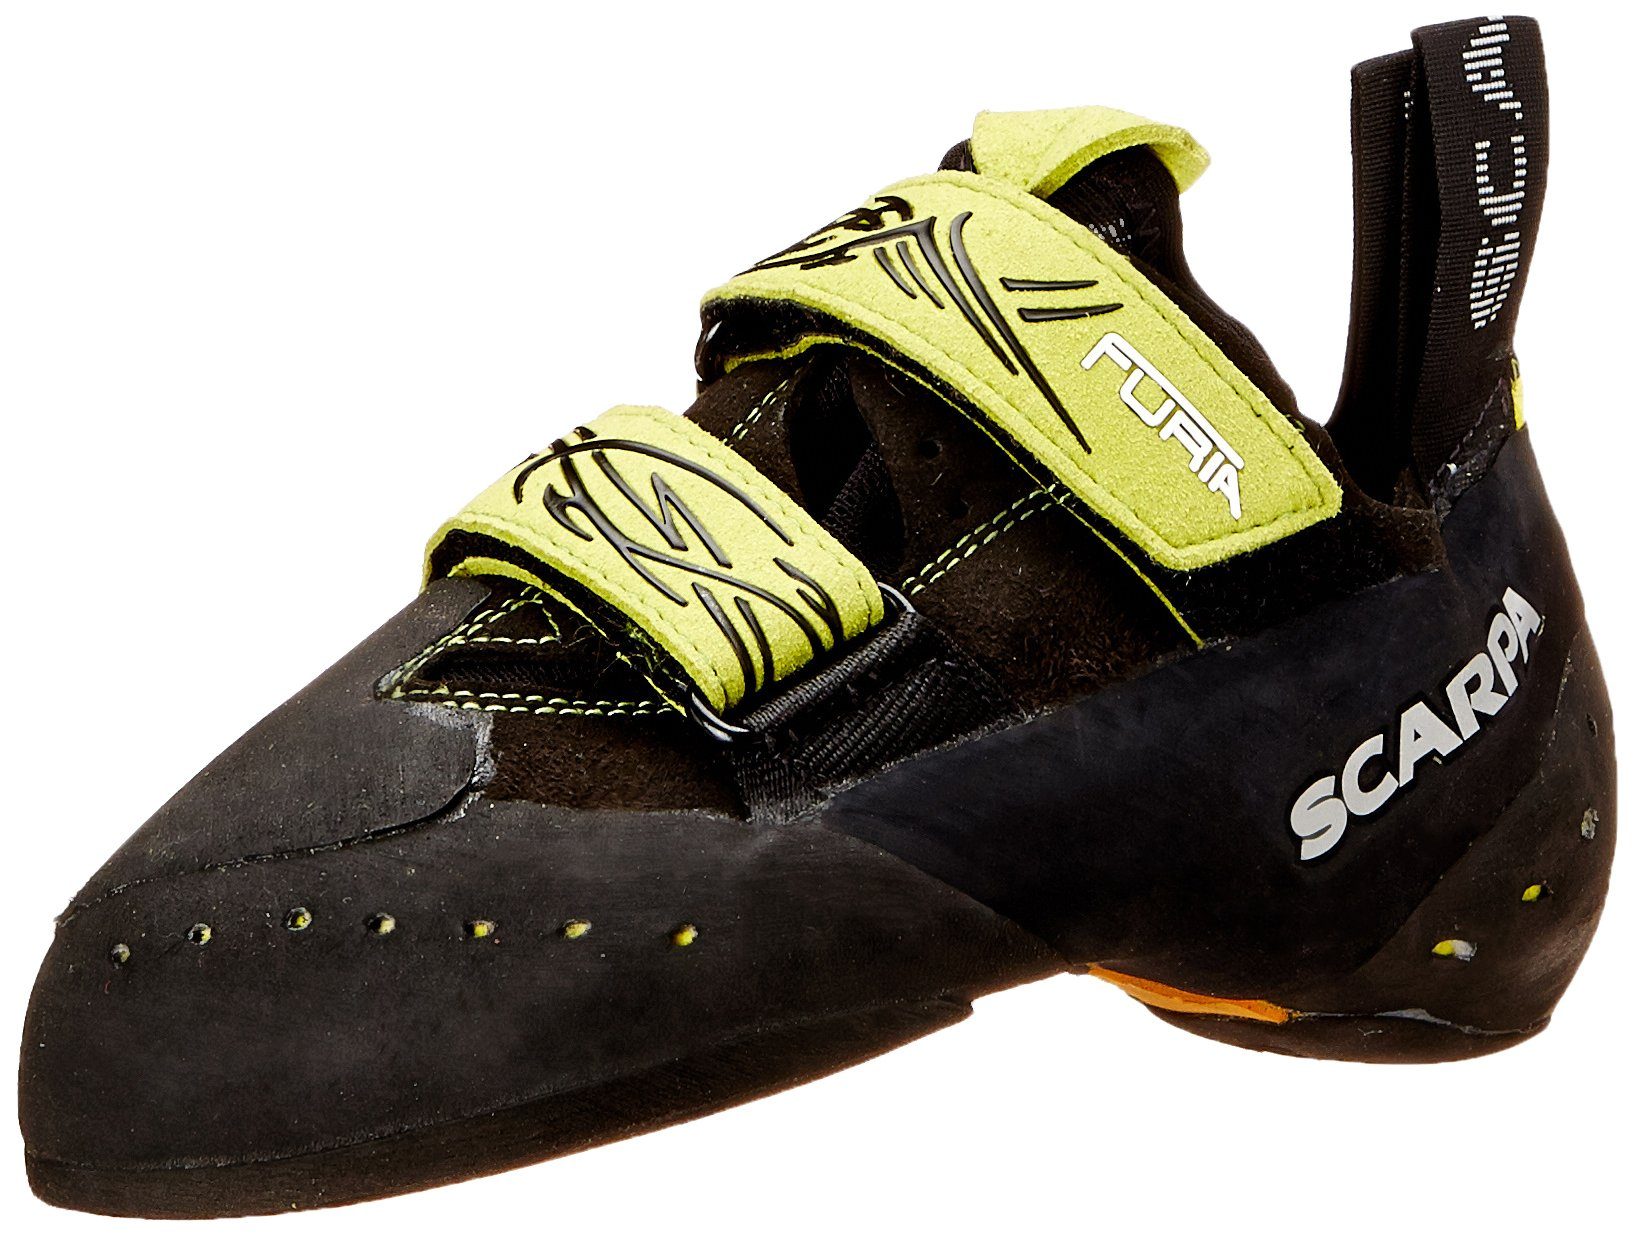 Scarpa Furia Climbing Shoe, Black/Lime, 42.5 EU/9.5 M US